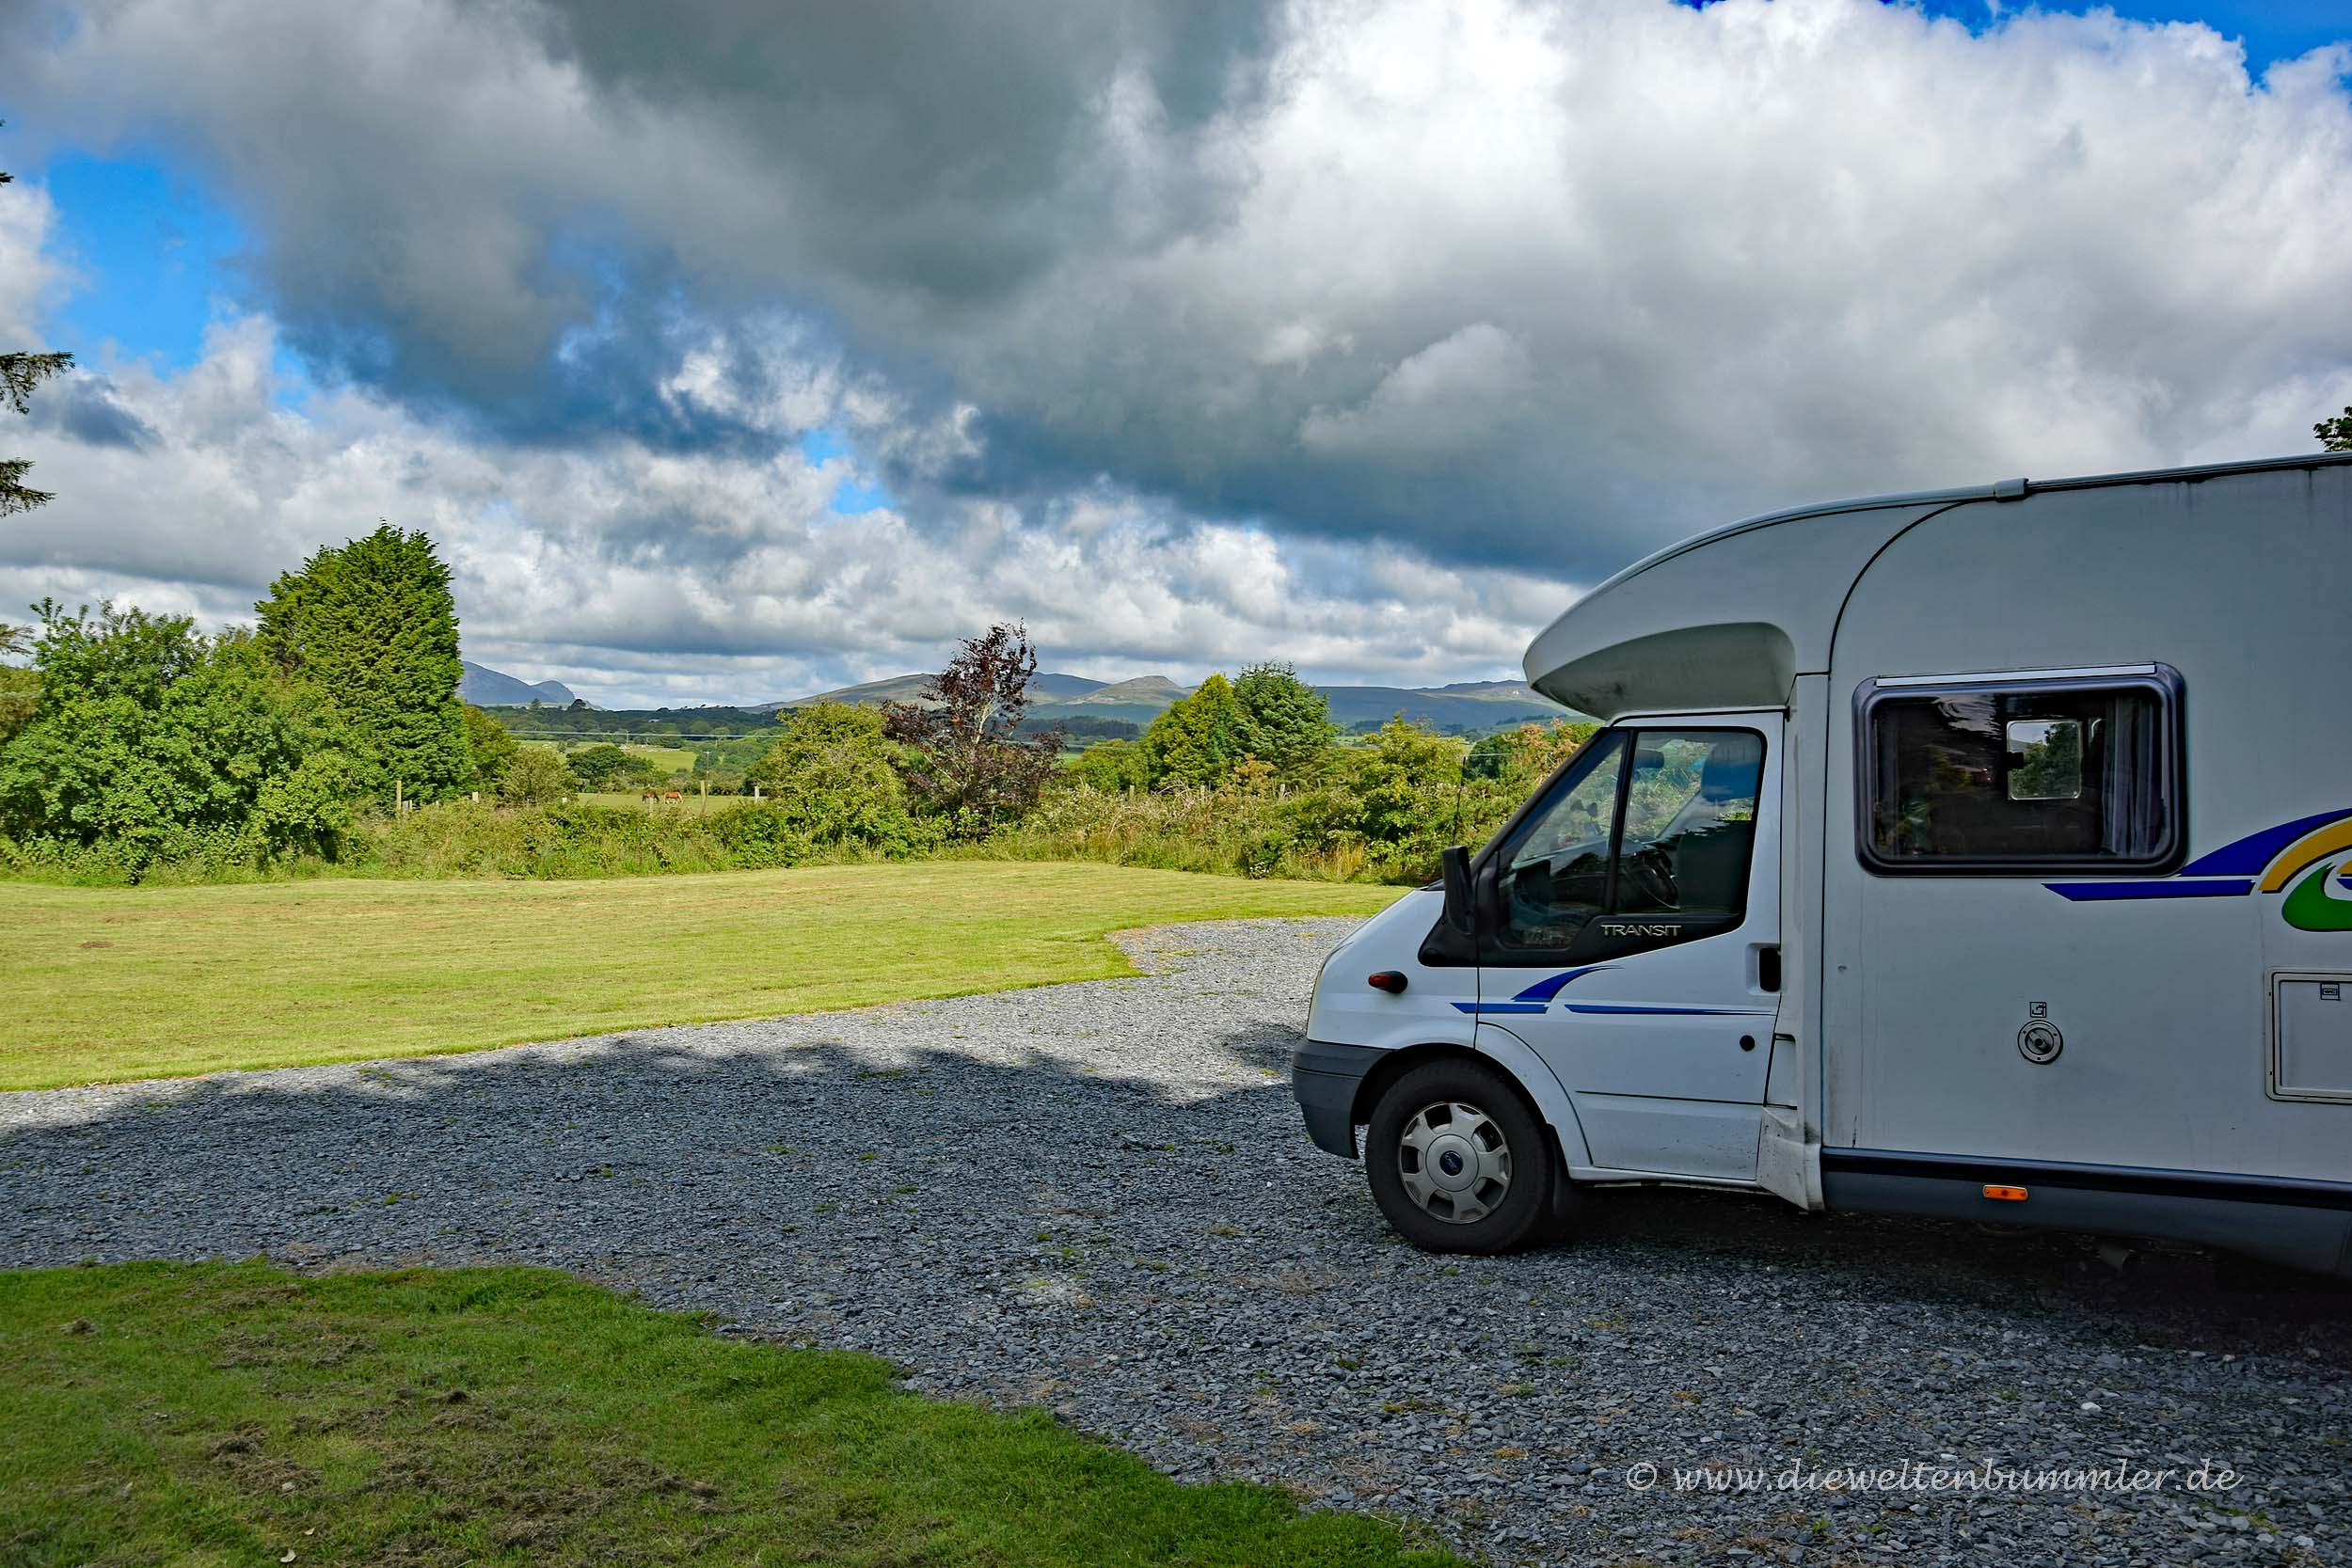 Camping mit Aussicht in Wales